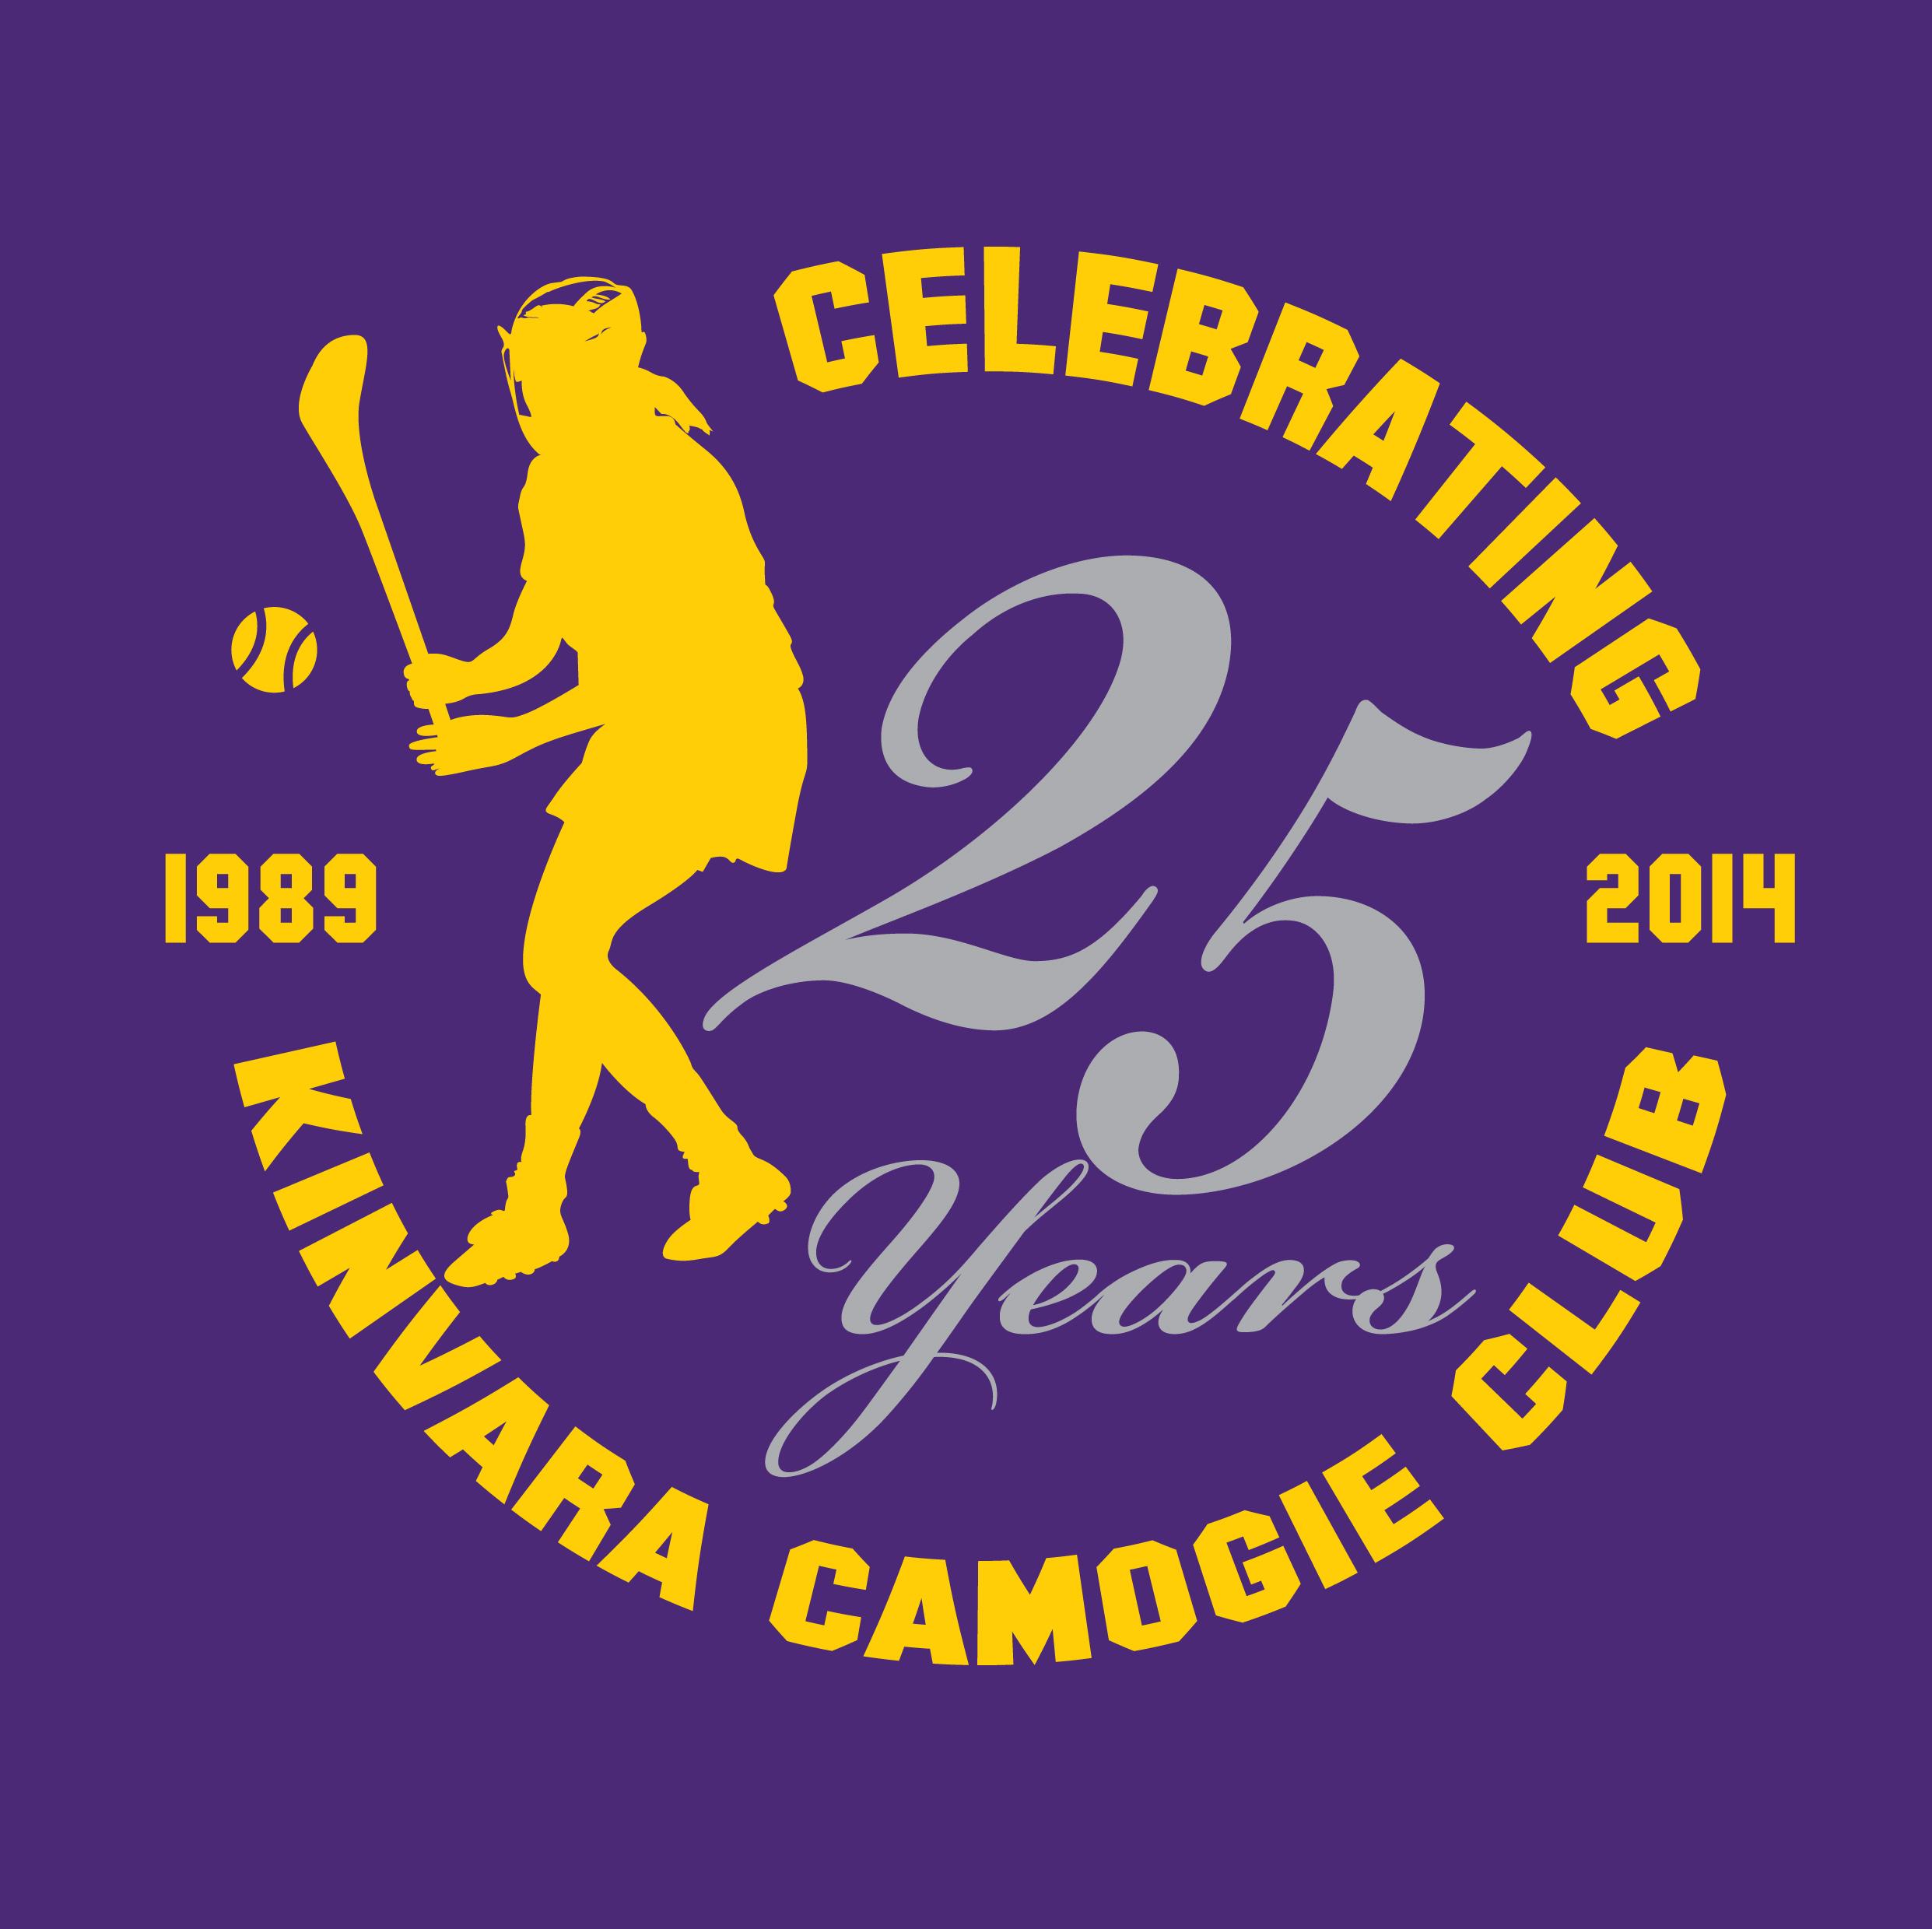 Kinvara Camogie Club